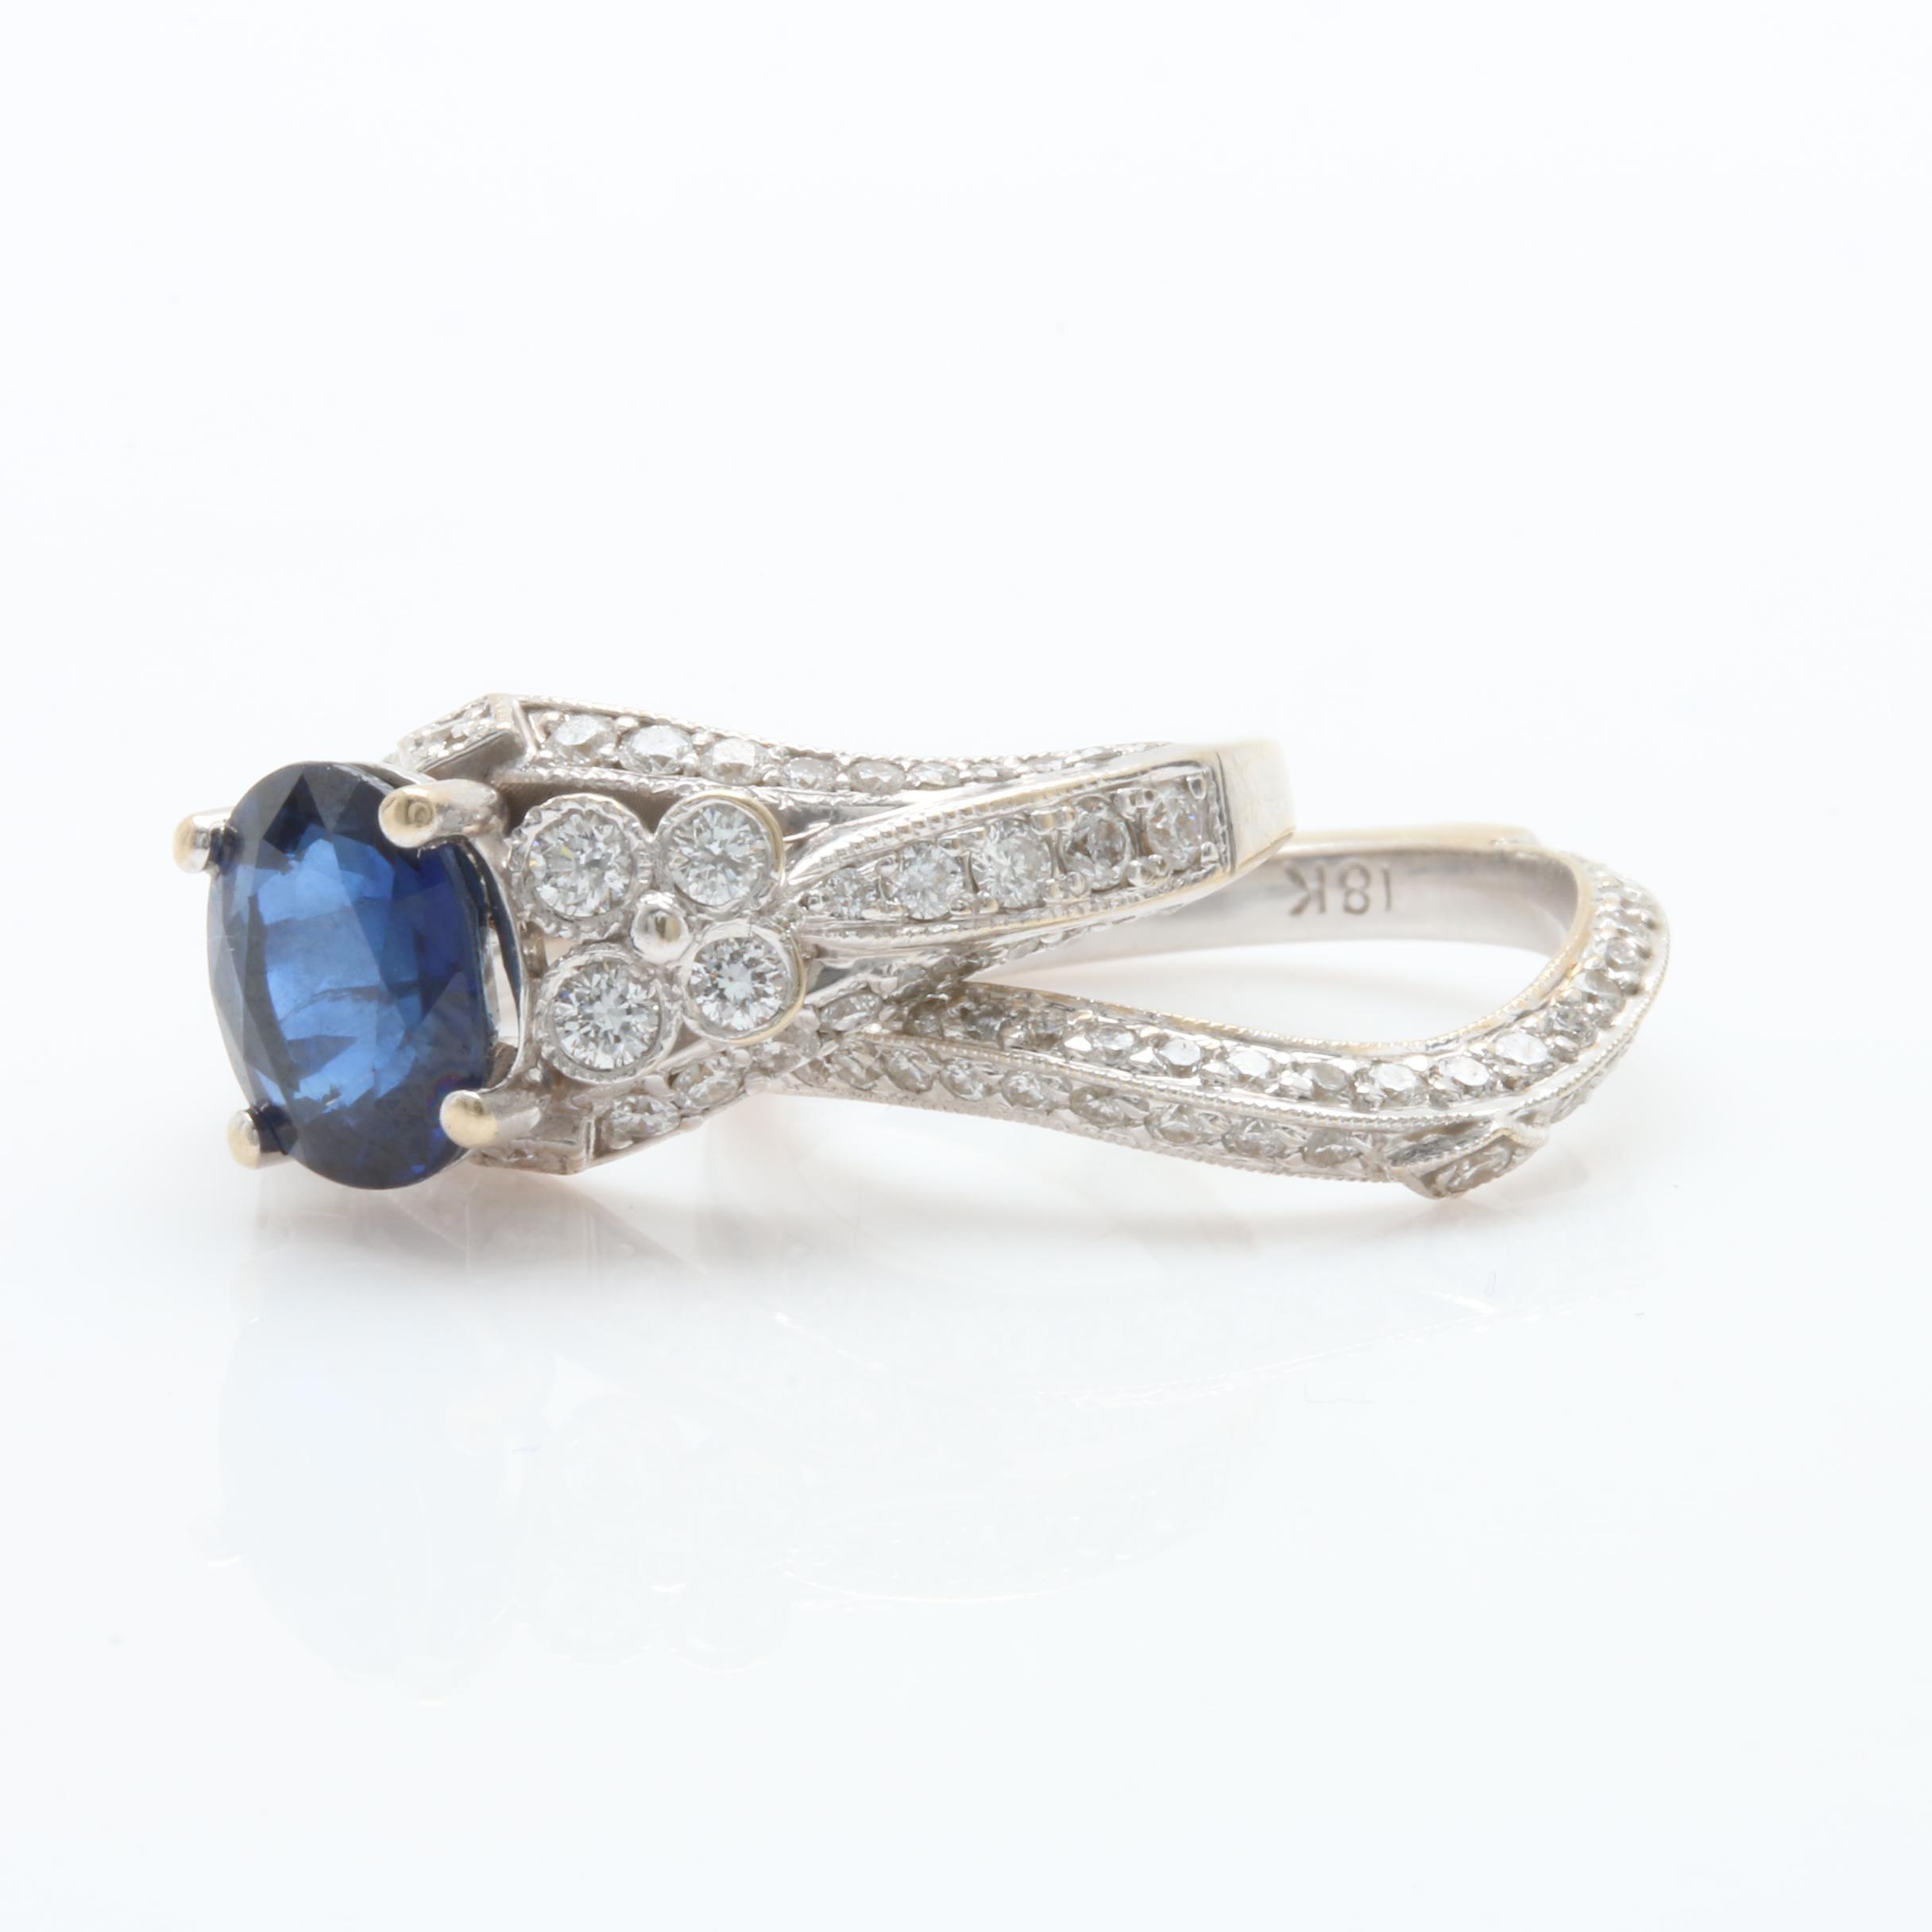 18K White Gold 1.73 CT Blue Sapphire and 1.09 CTW Diamond Ring Set